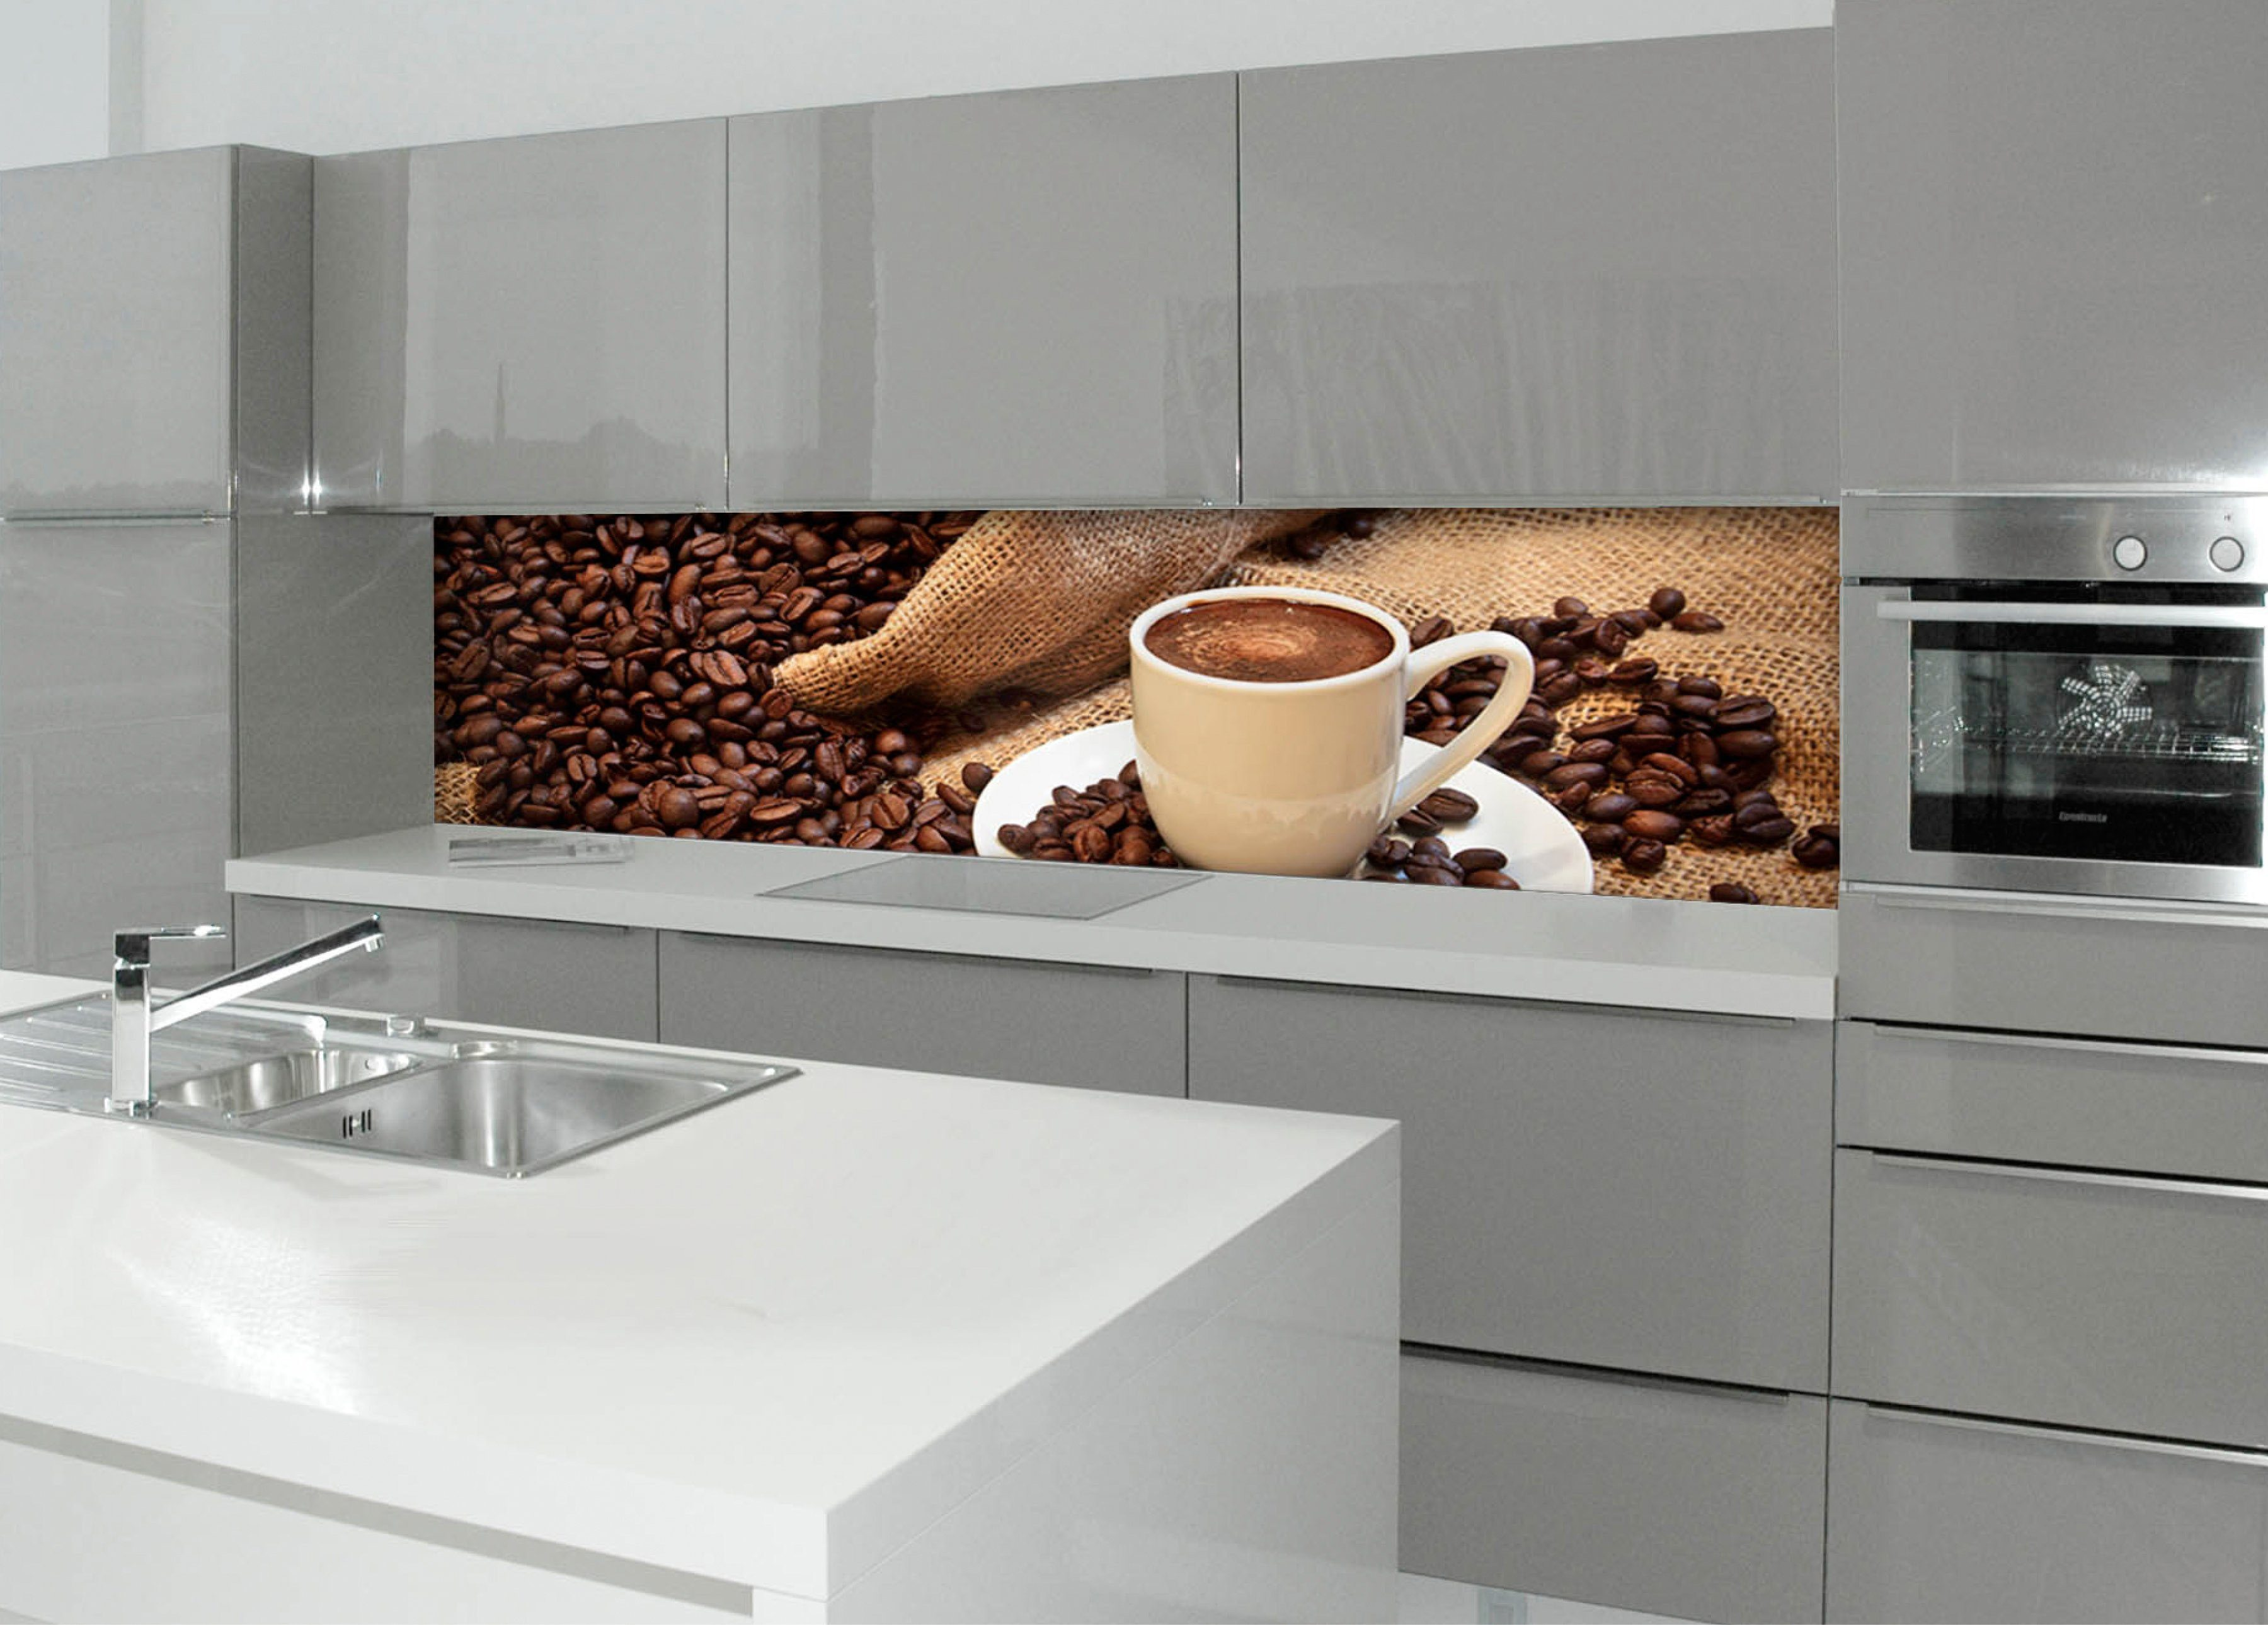 Küchenrückwand - Spritzschutz »profix«, Kaffeepause, 220x60 cm